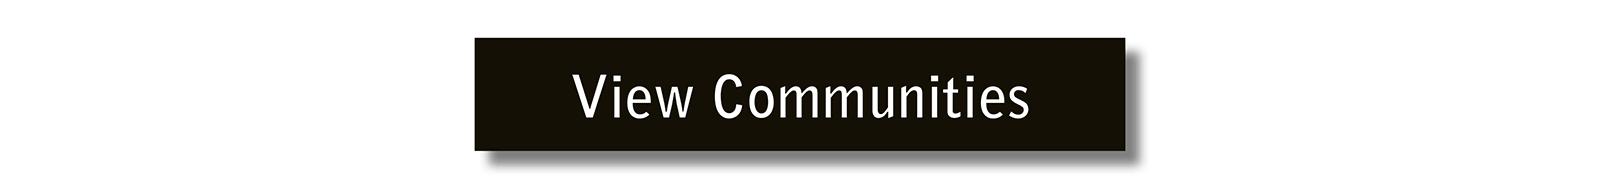 View Communities button